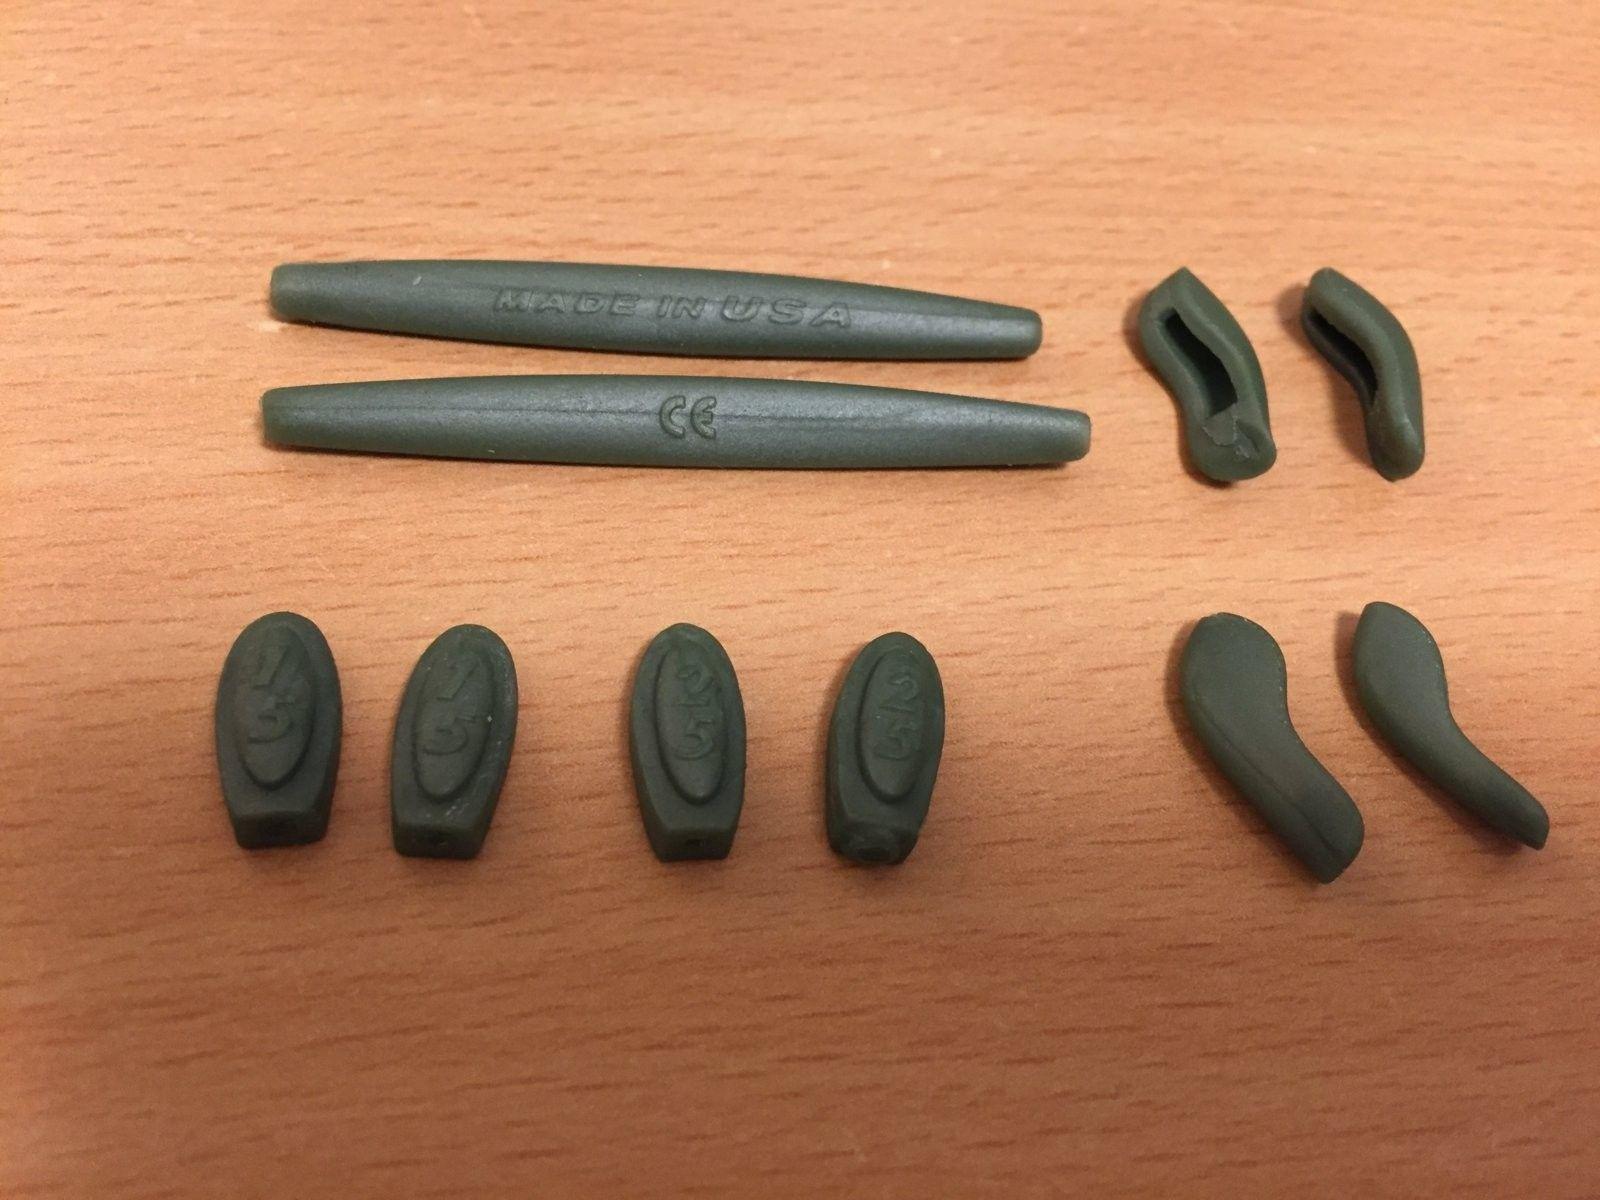 Juliet green rubber kit (10 pieces set): $50 + shipping - IMG_0708.JPG